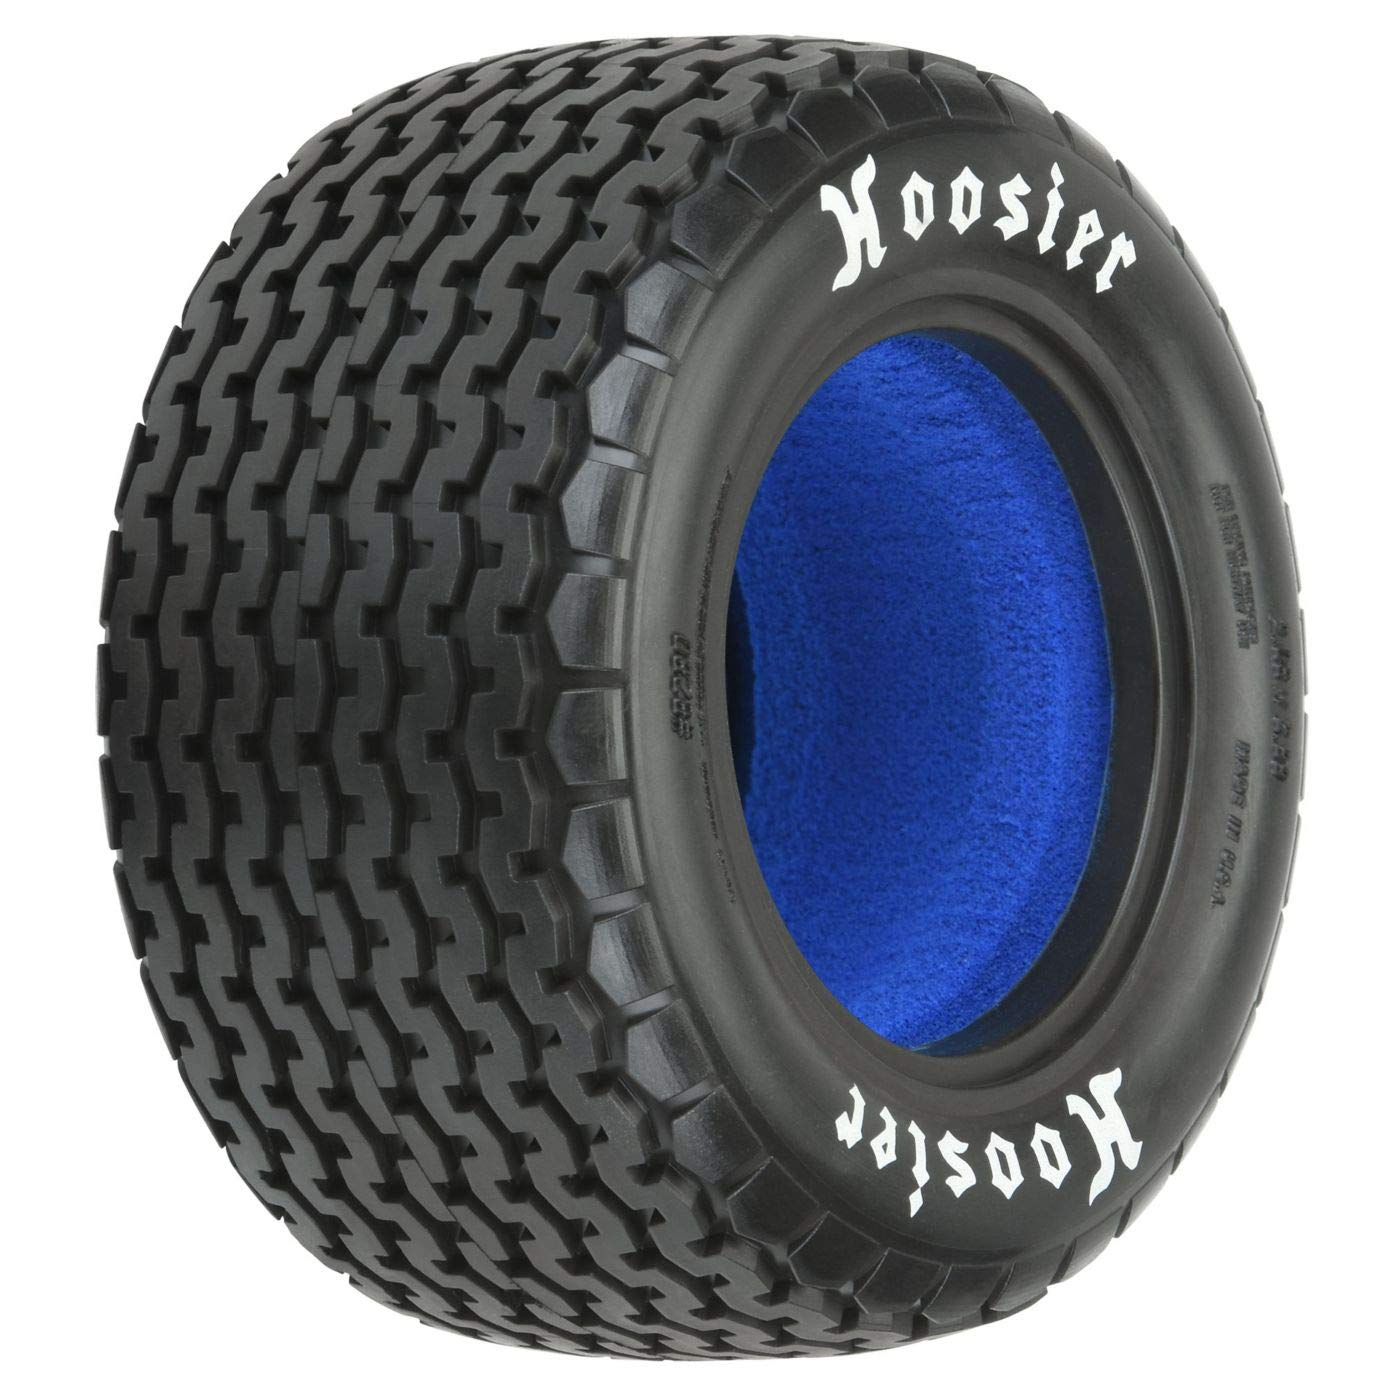 Hoosier Racing Tire 18030JR3 Tire-18.0//8.0-8 JR3